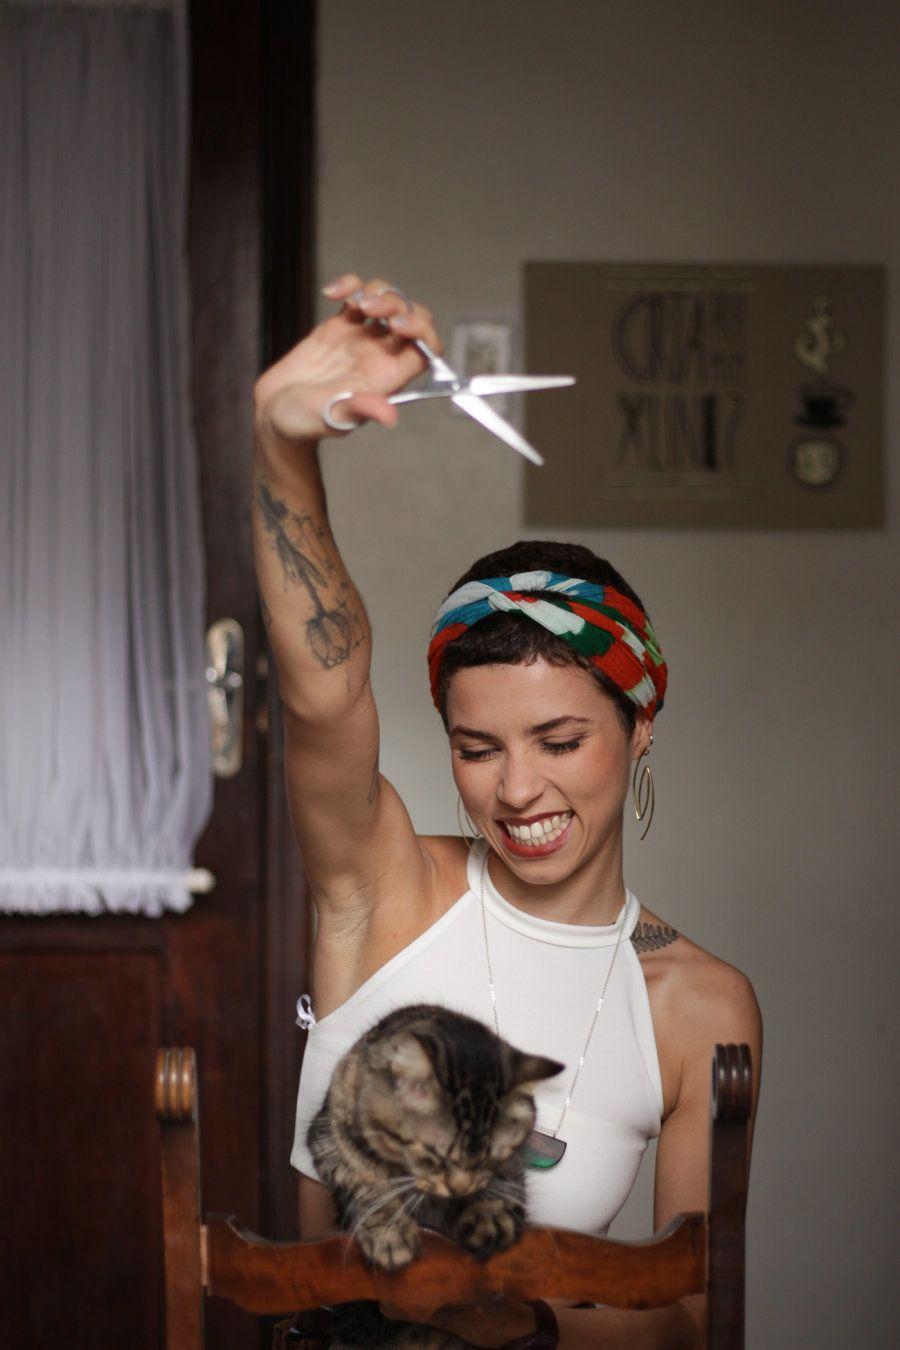 Aline aprendeu a dominar a arte da tesoura desde pequena, pois ela sempre cortava o próprio